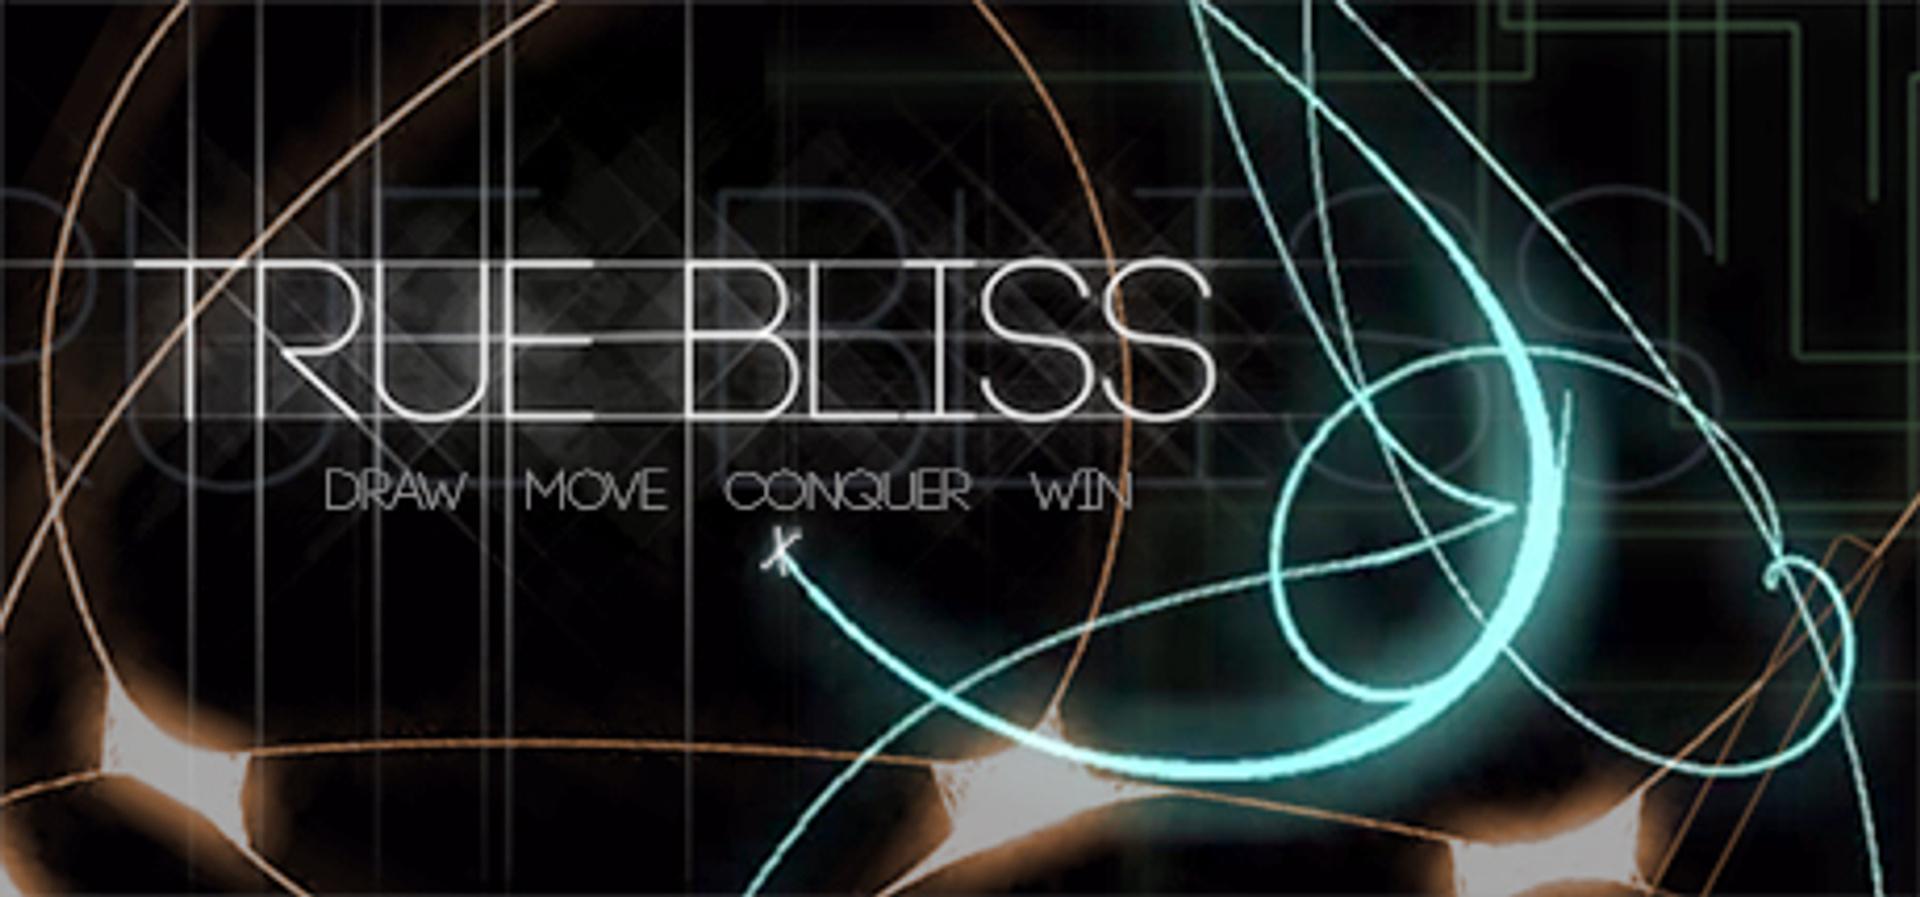 buy True Bliss cd key for pc platform